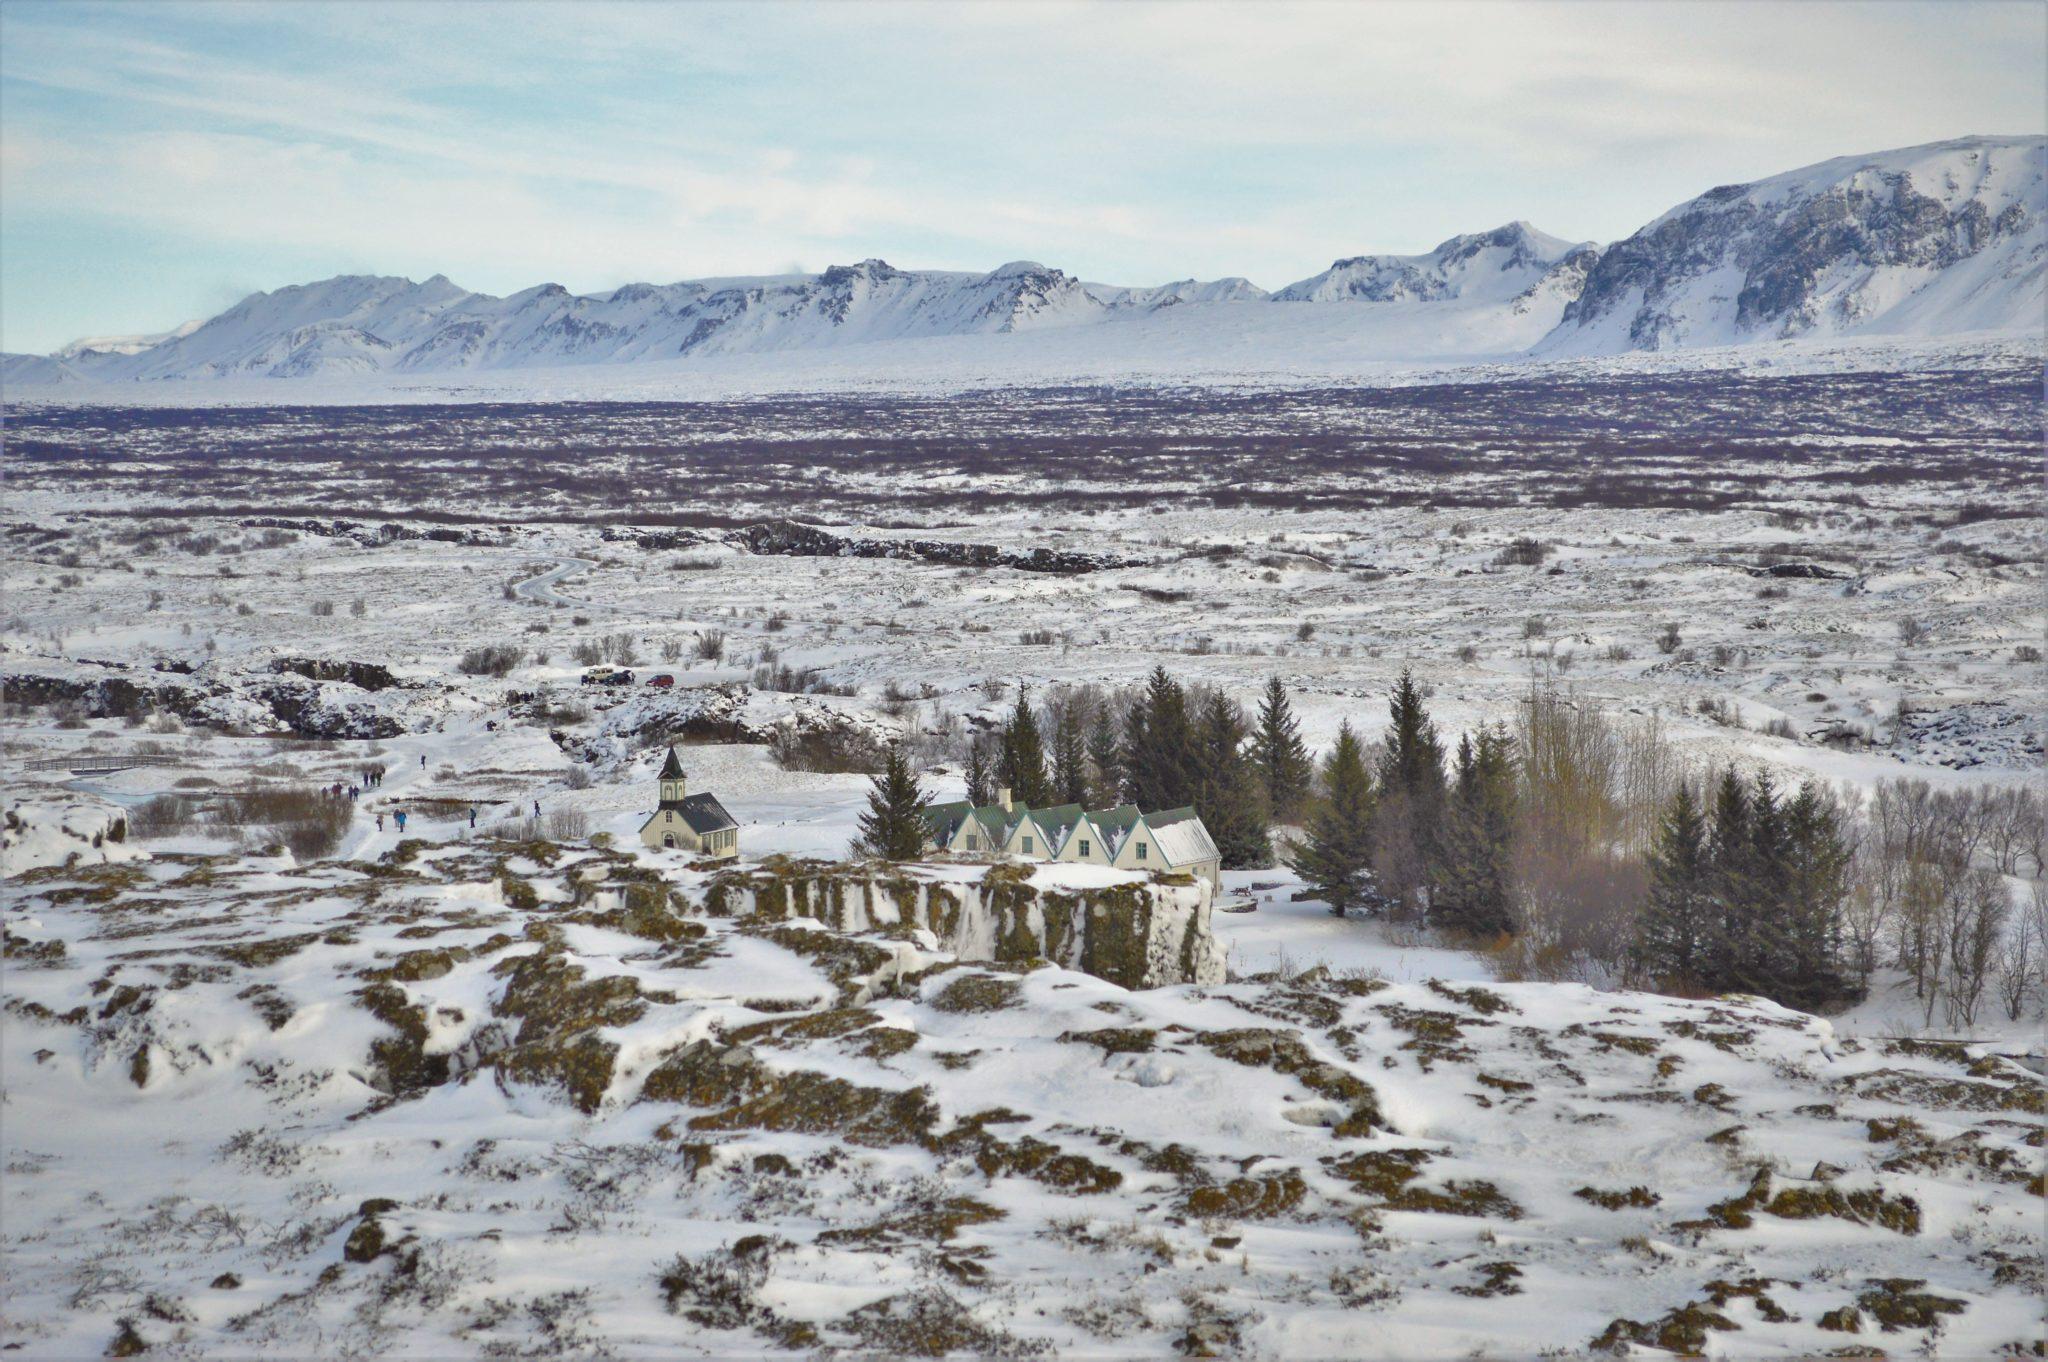 Þingvellir National Park in the Golden Circle, Iceland